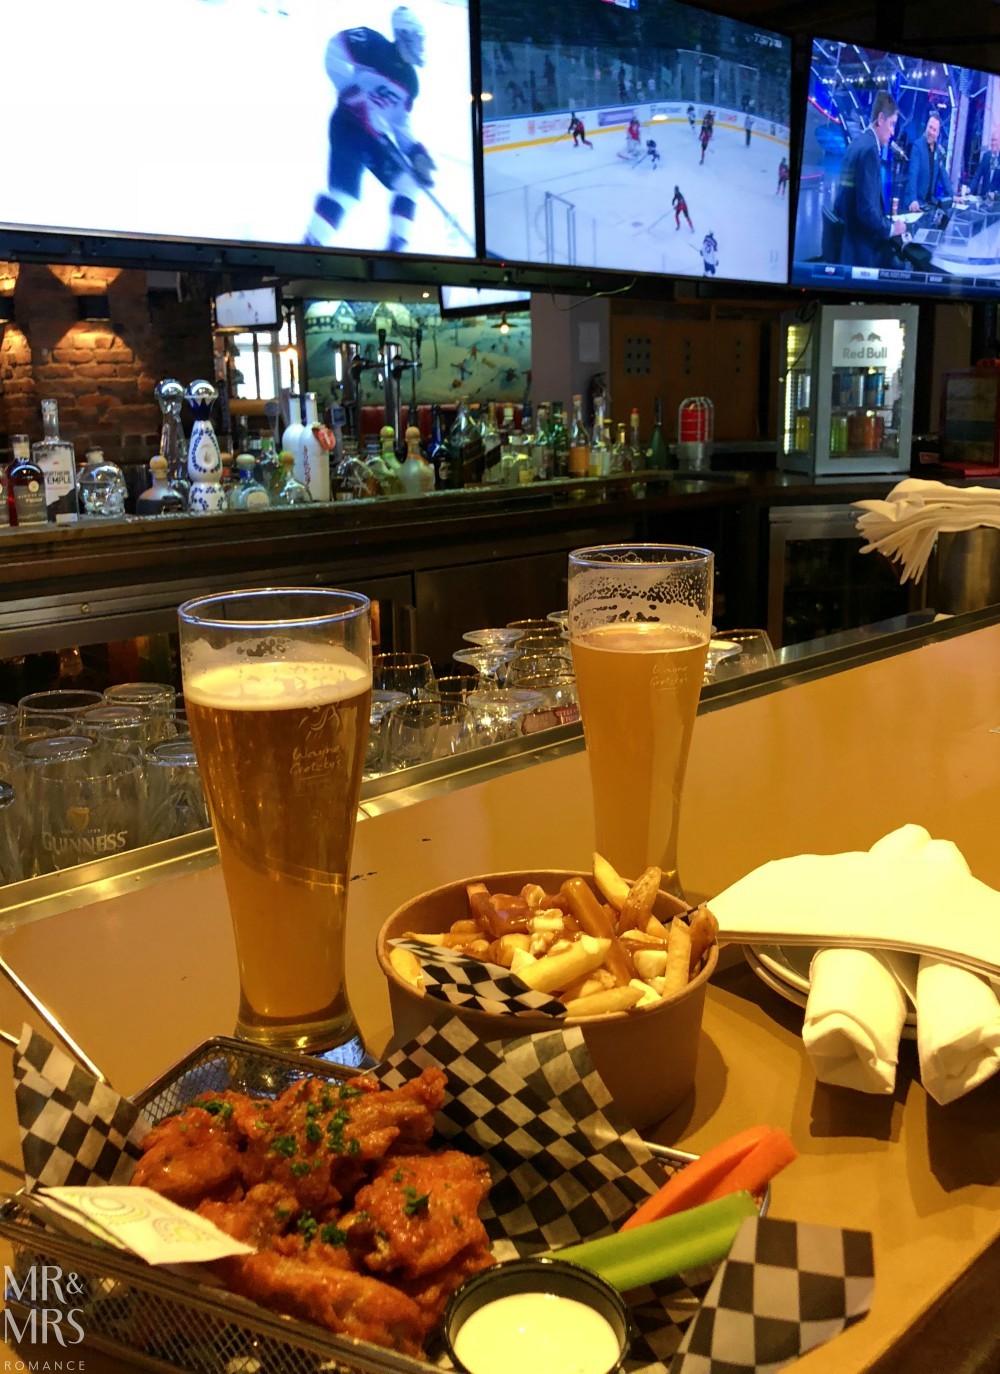 Where to eat in Toronto - Wayne Gretzky's - Mr & Mrs Romance